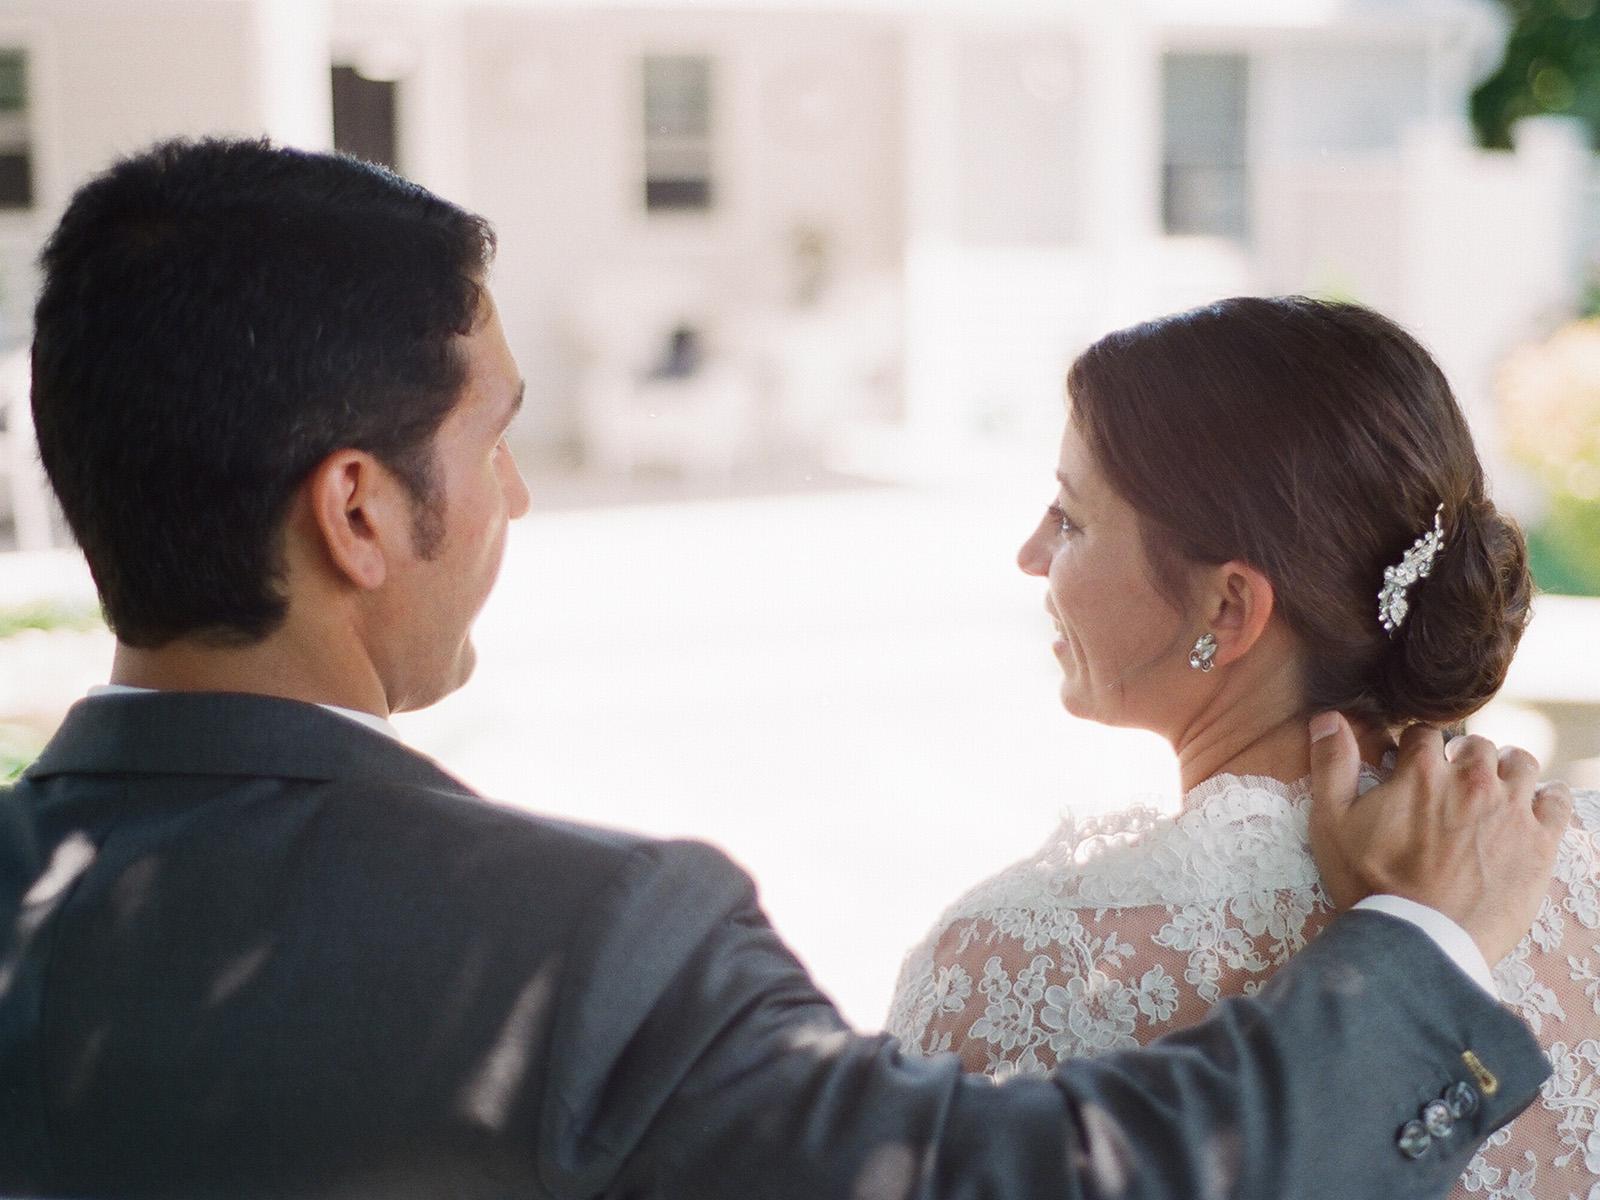 groom has hand on bride's shoulder